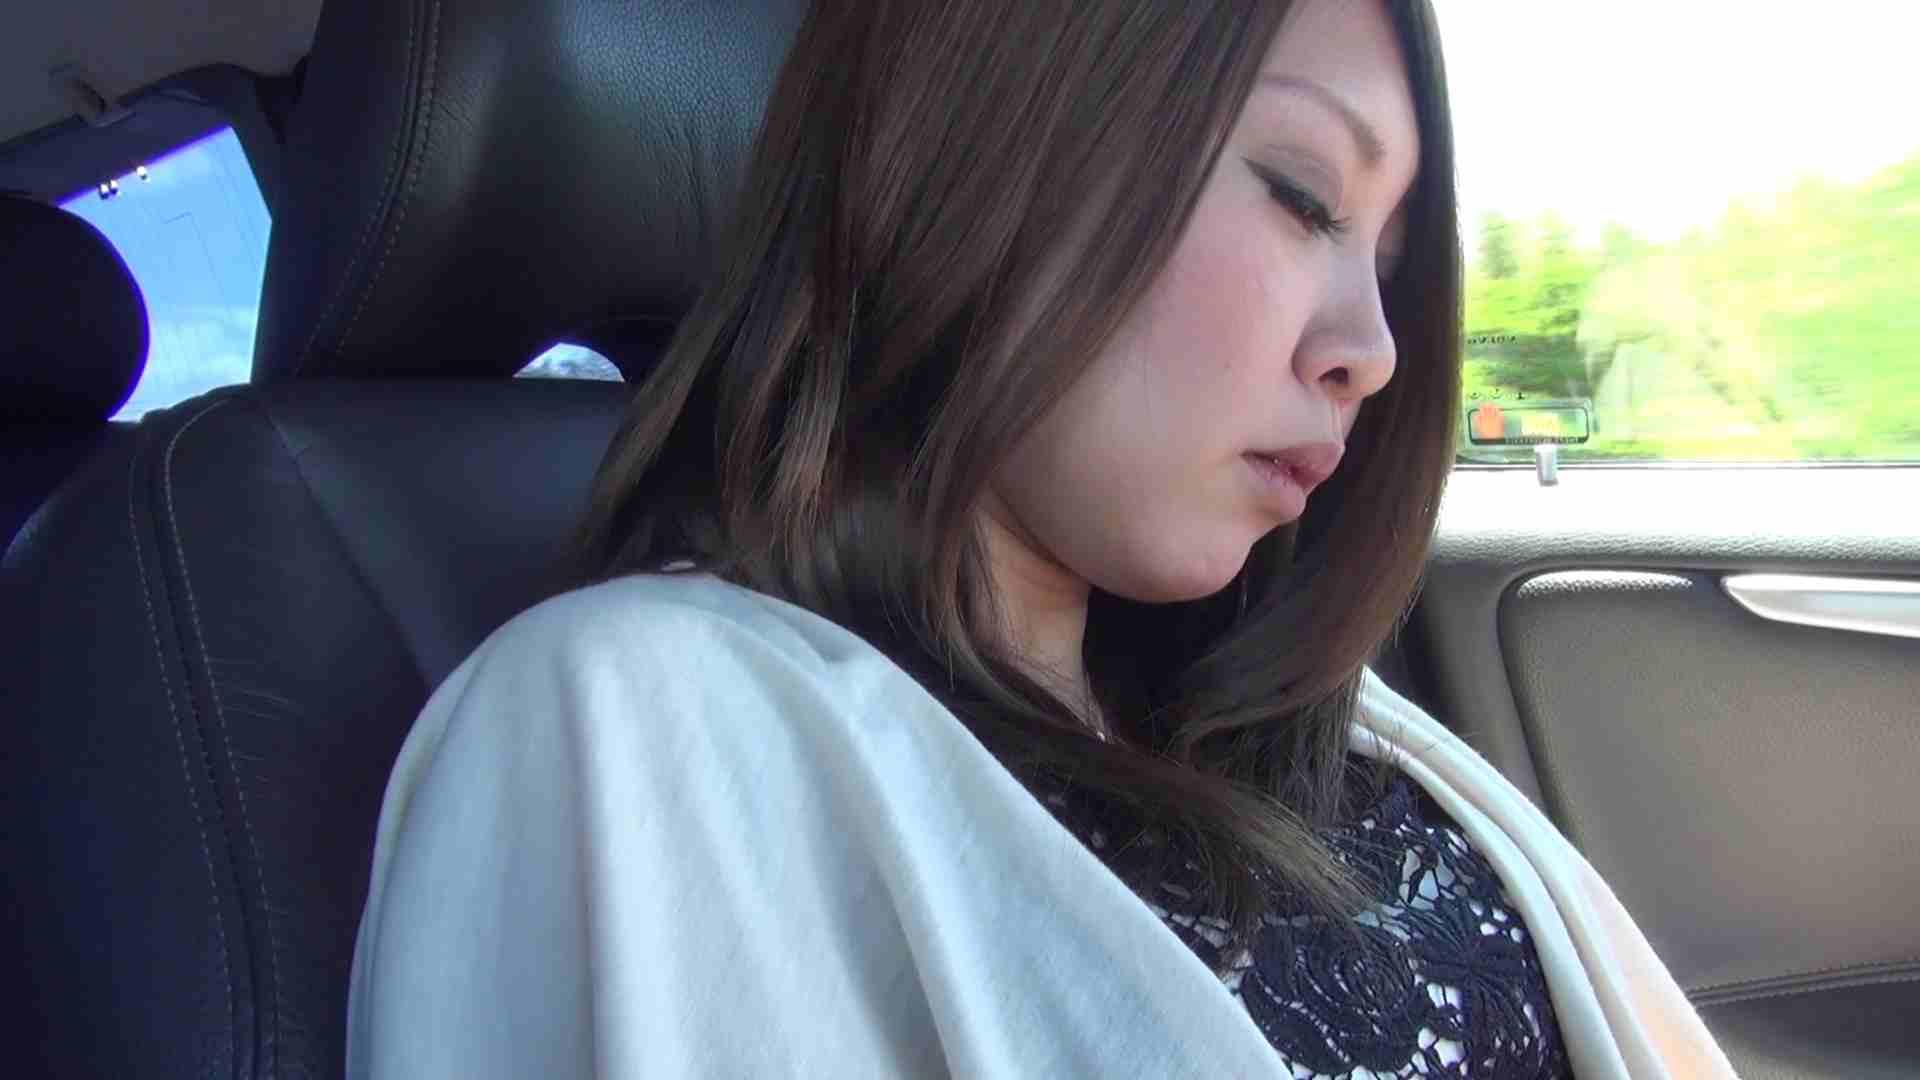 episode6 ドライブ中に・・・妻に強せいオナニー オナニー  106pic 38